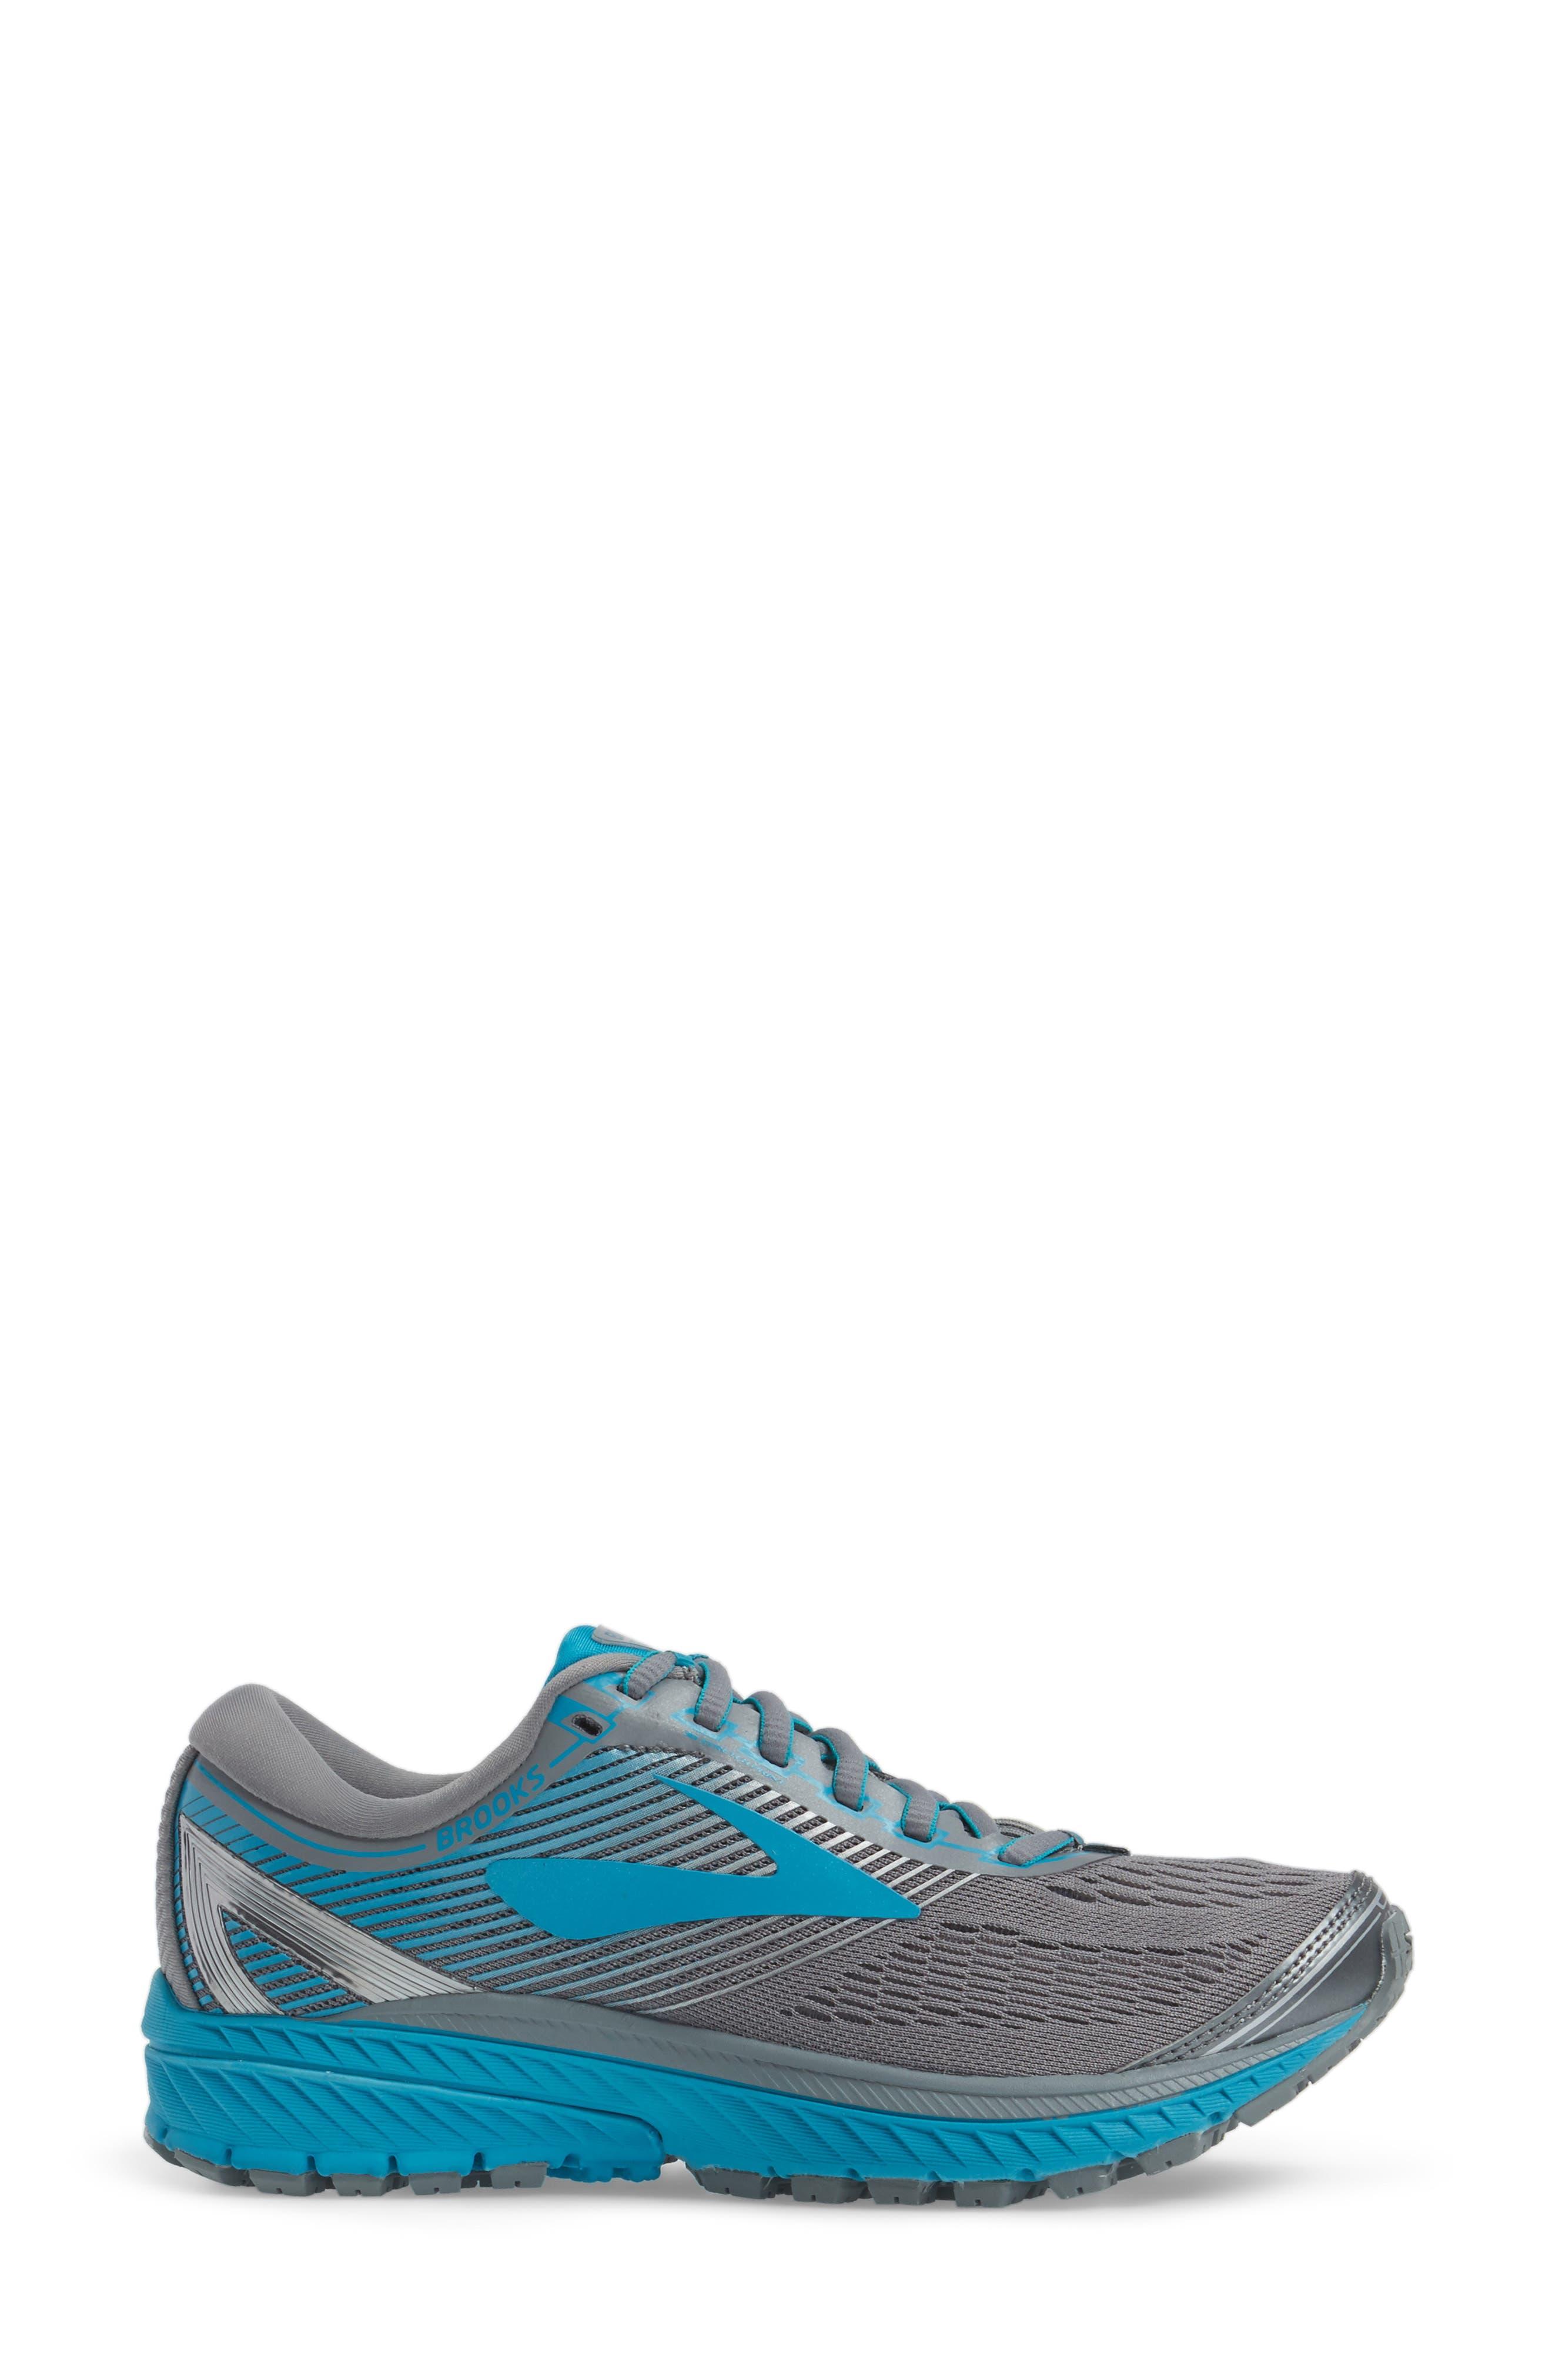 Ghost 10 Running Shoe,                             Alternate thumbnail 3, color,                             Primer Grey/ Teal/ Silver